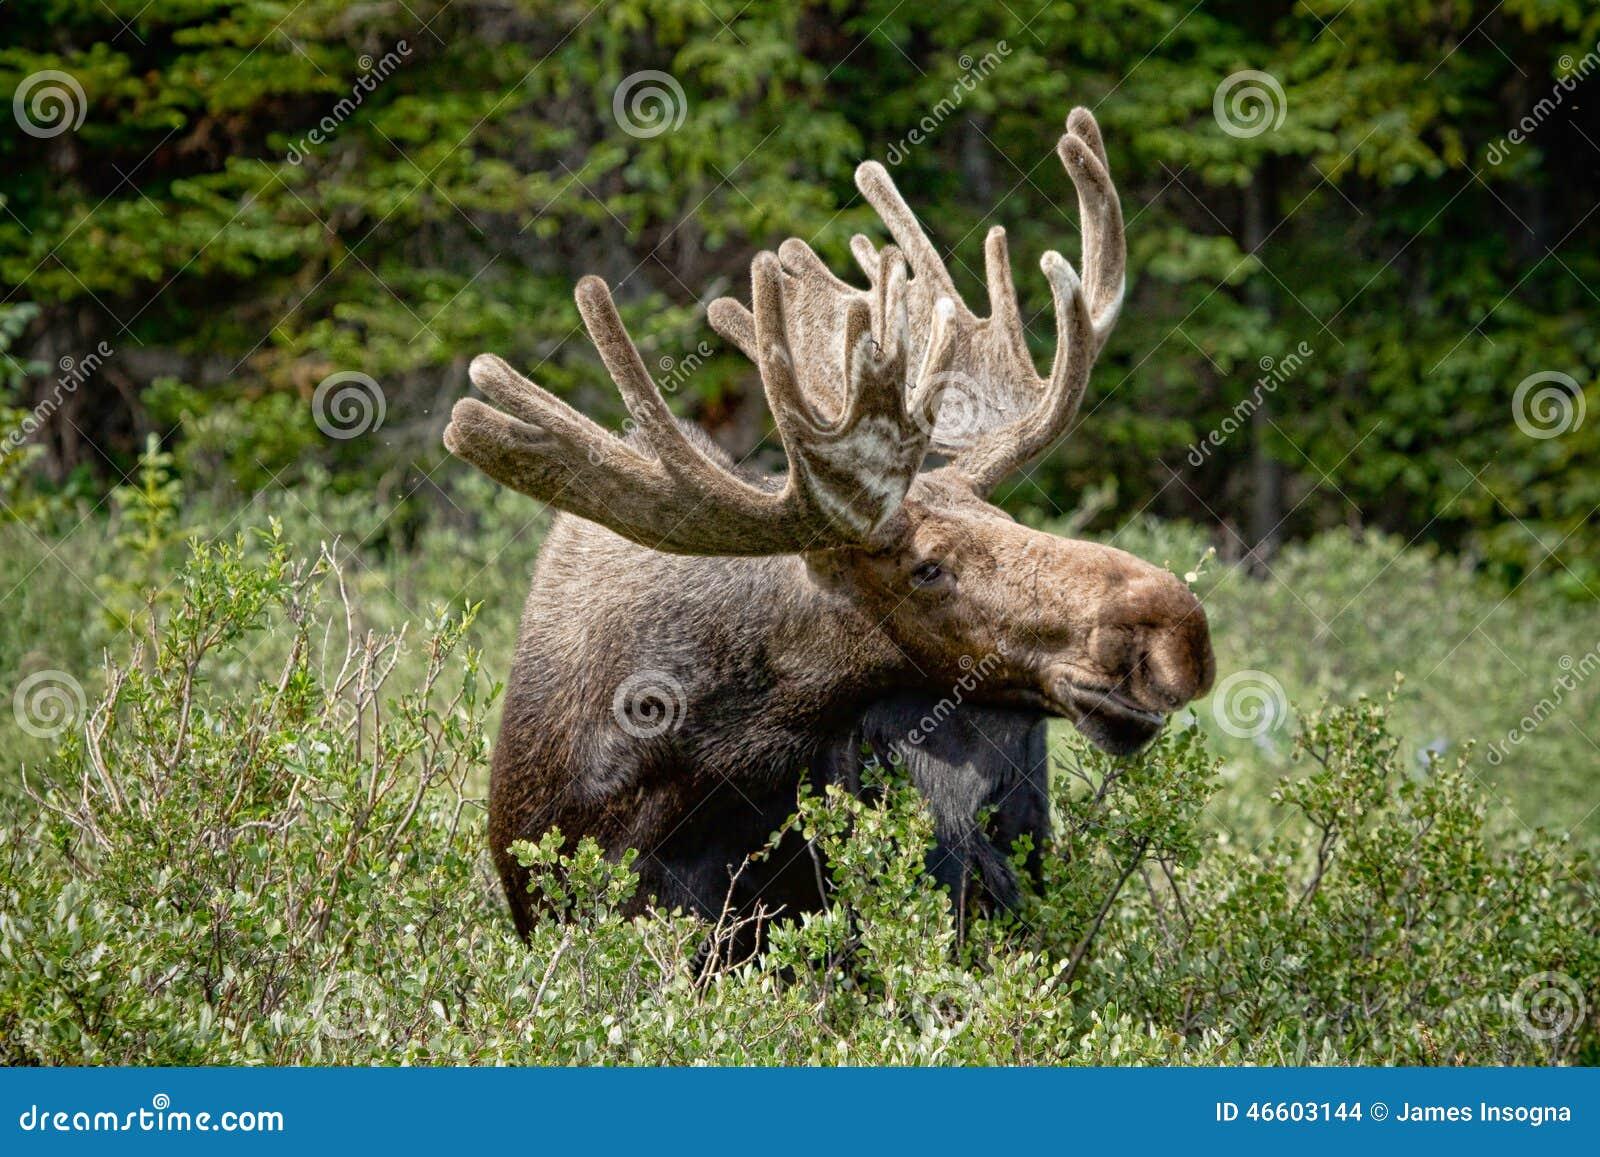 Wildlife Scene Sweden Moose Lying Grass Stock Photo 515870854 ...